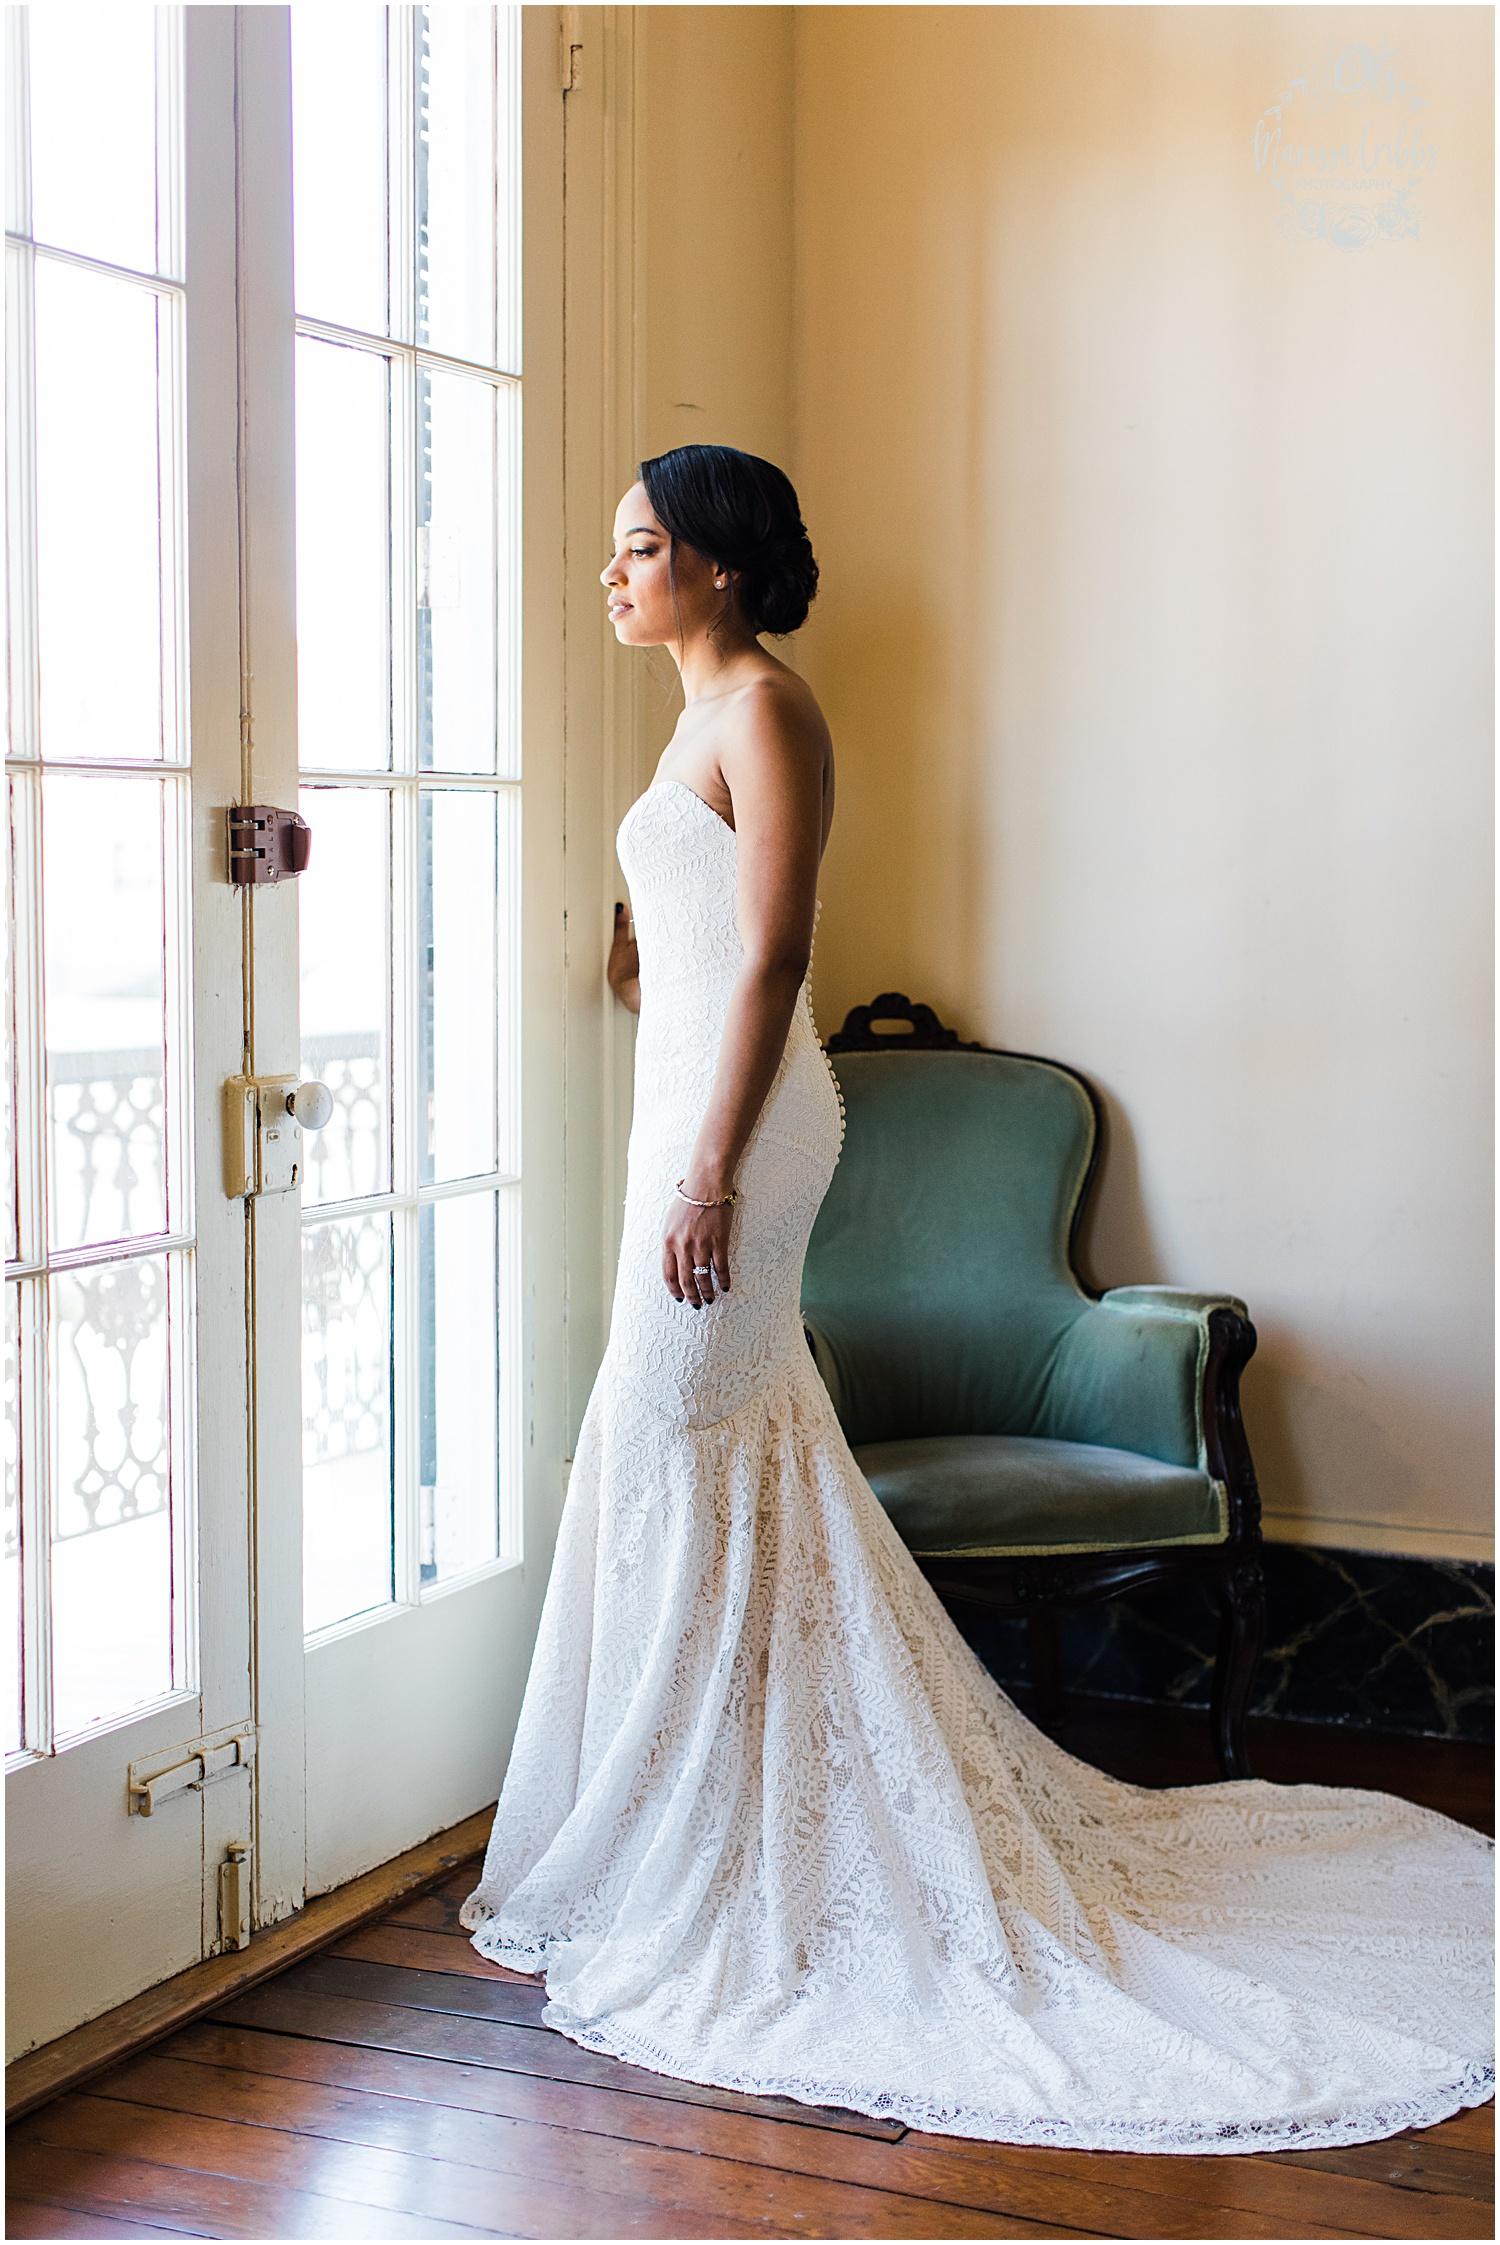 NEW ORLEANS WEDDING   BENACHI HOUSE   SARAH & MICHAEL   MARISSA CRIBBS PHOTOGRAPHY_4400.jpg